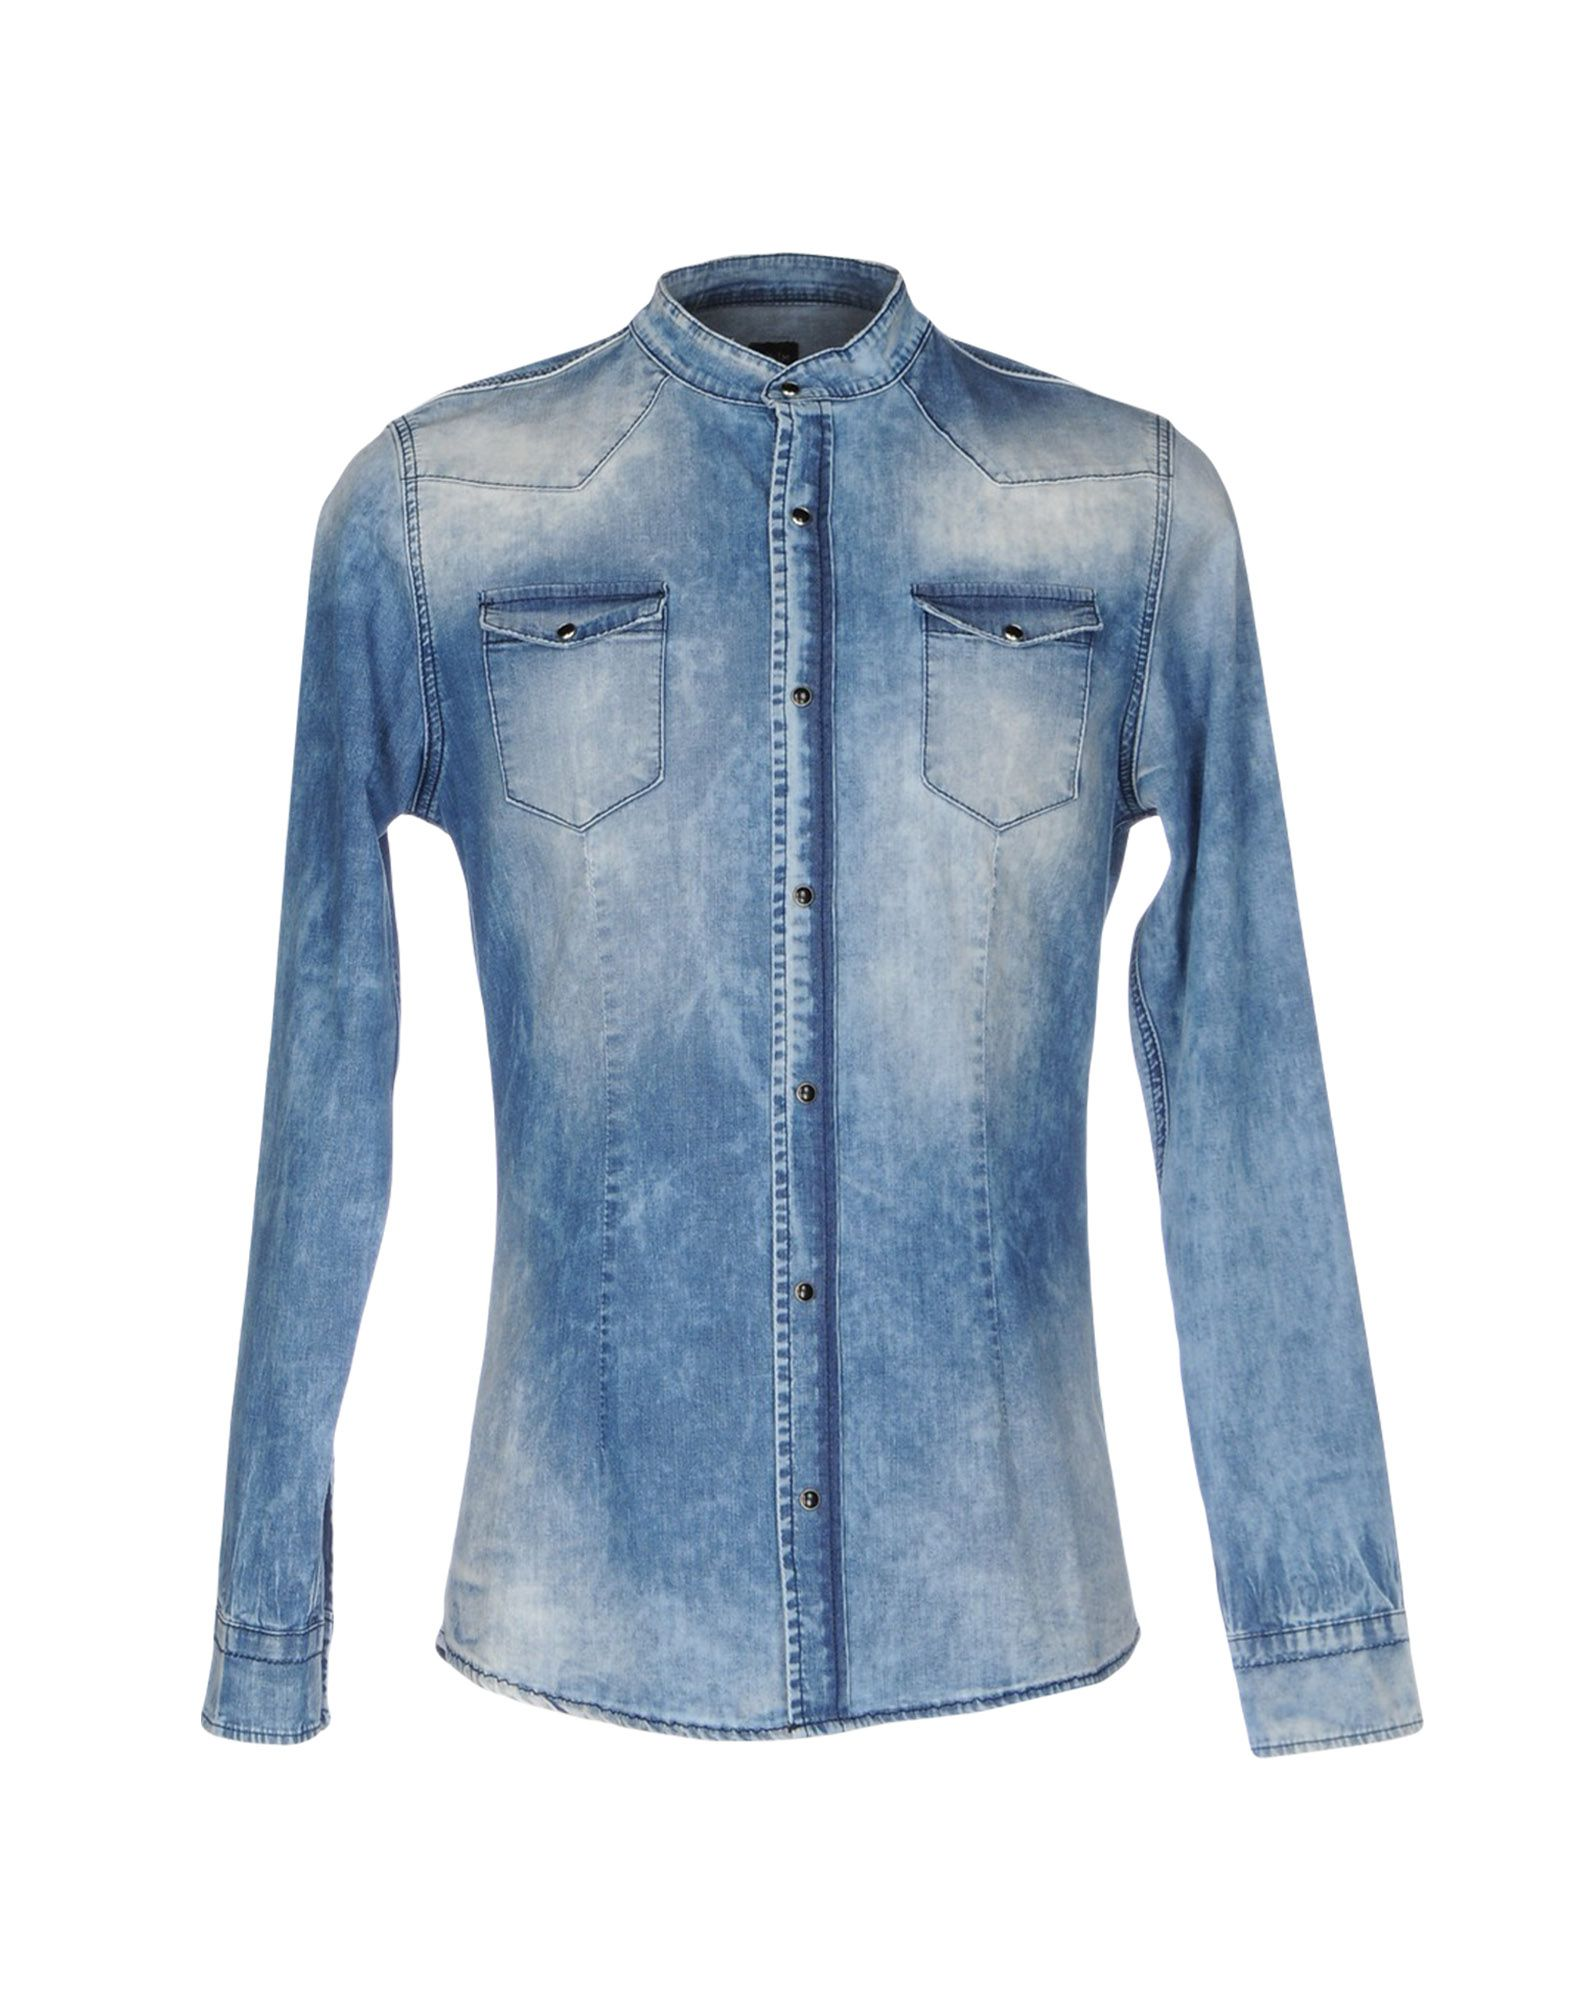 DANIELE ALESSANDRINI Джинсовая рубашка рубашка daniele alessandrini рубашка